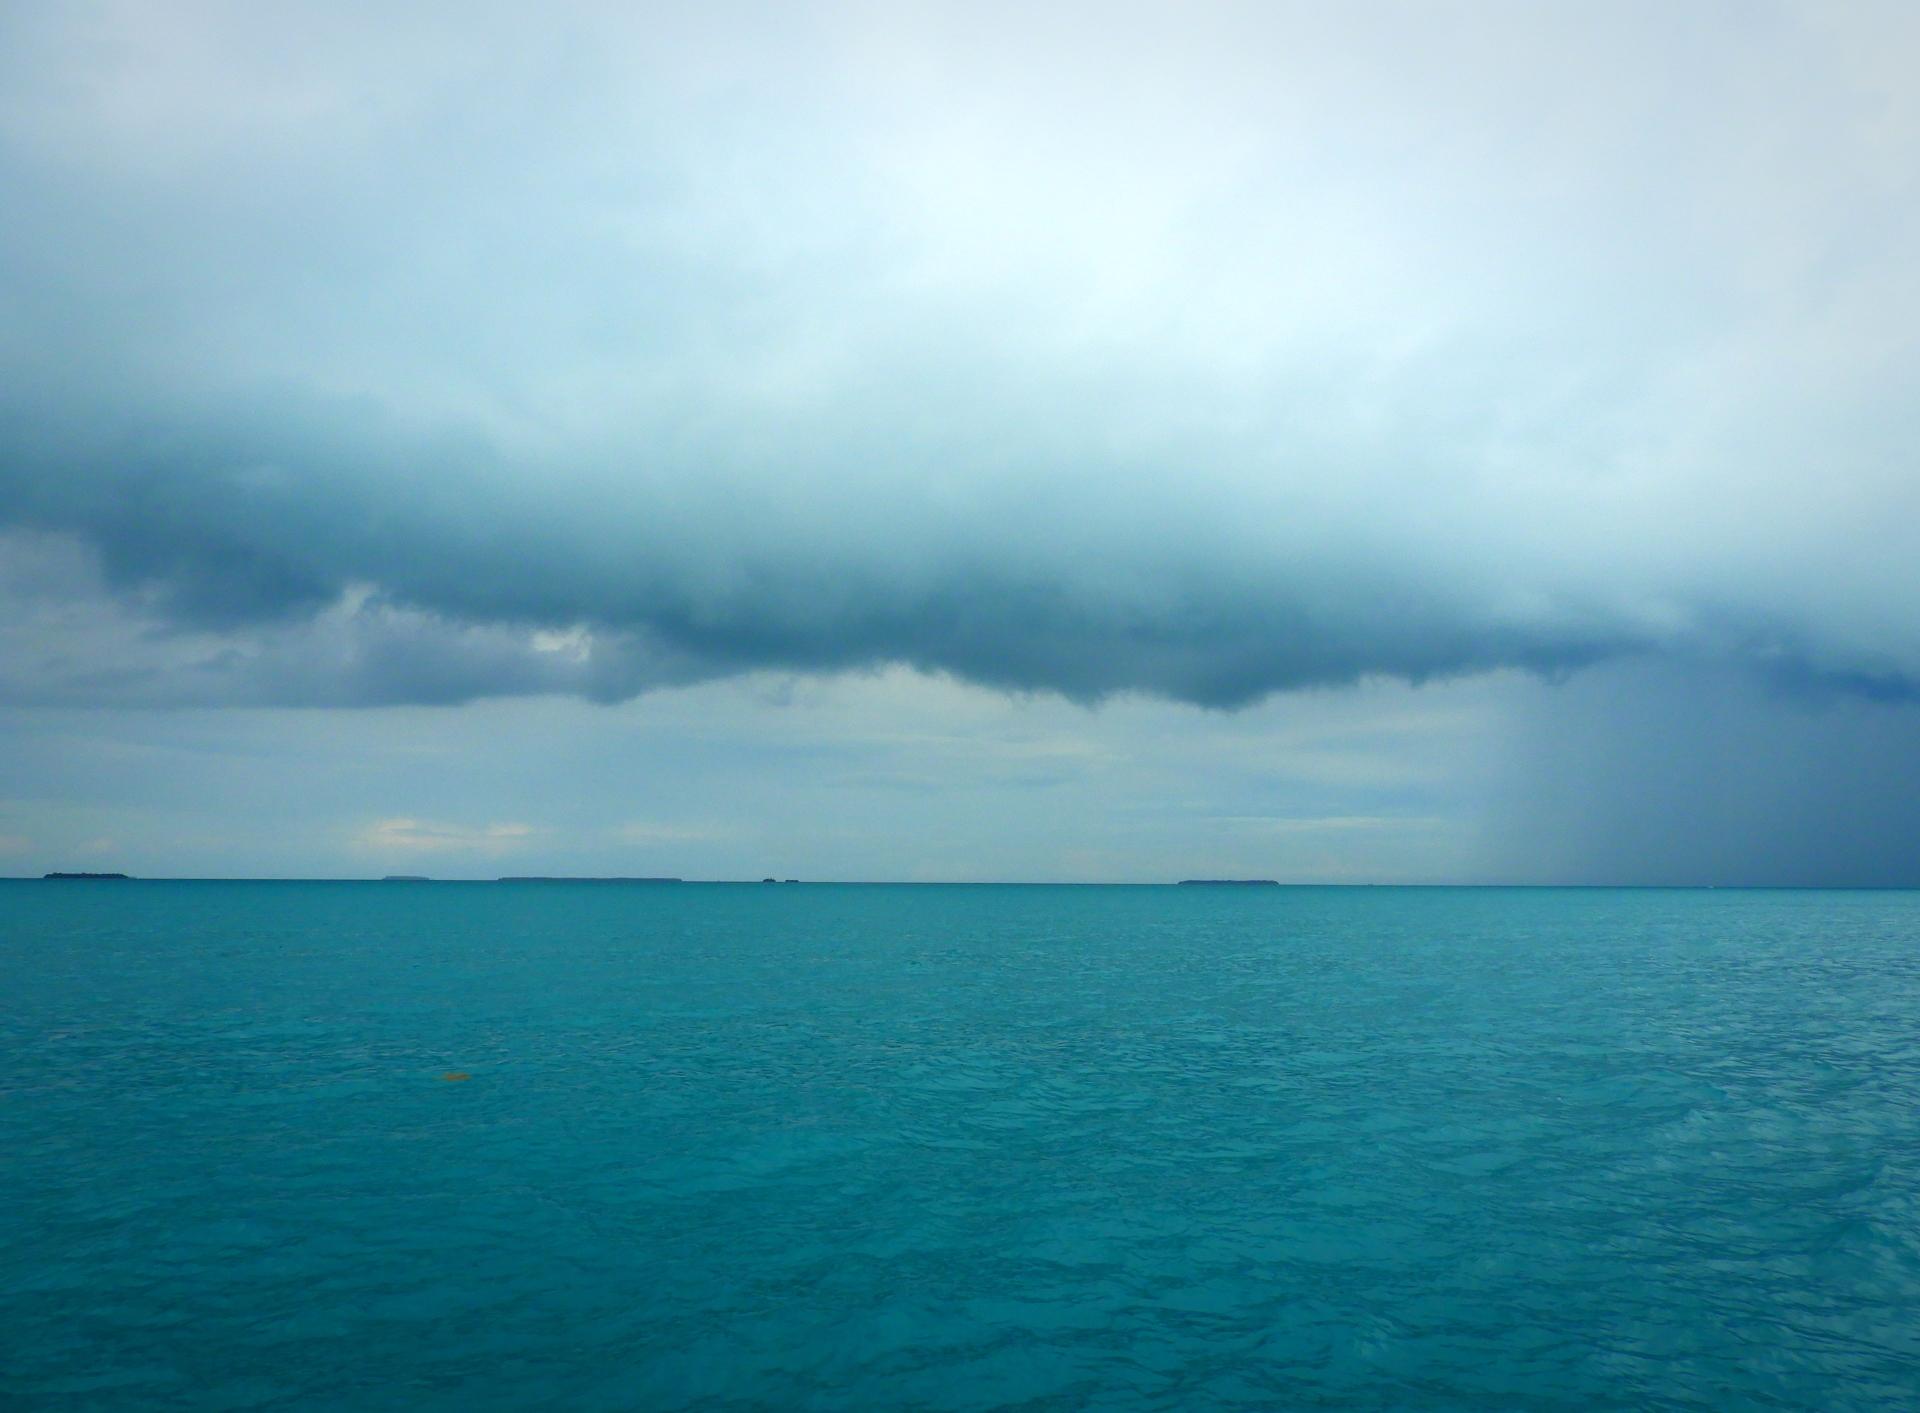 Squall on Gulf